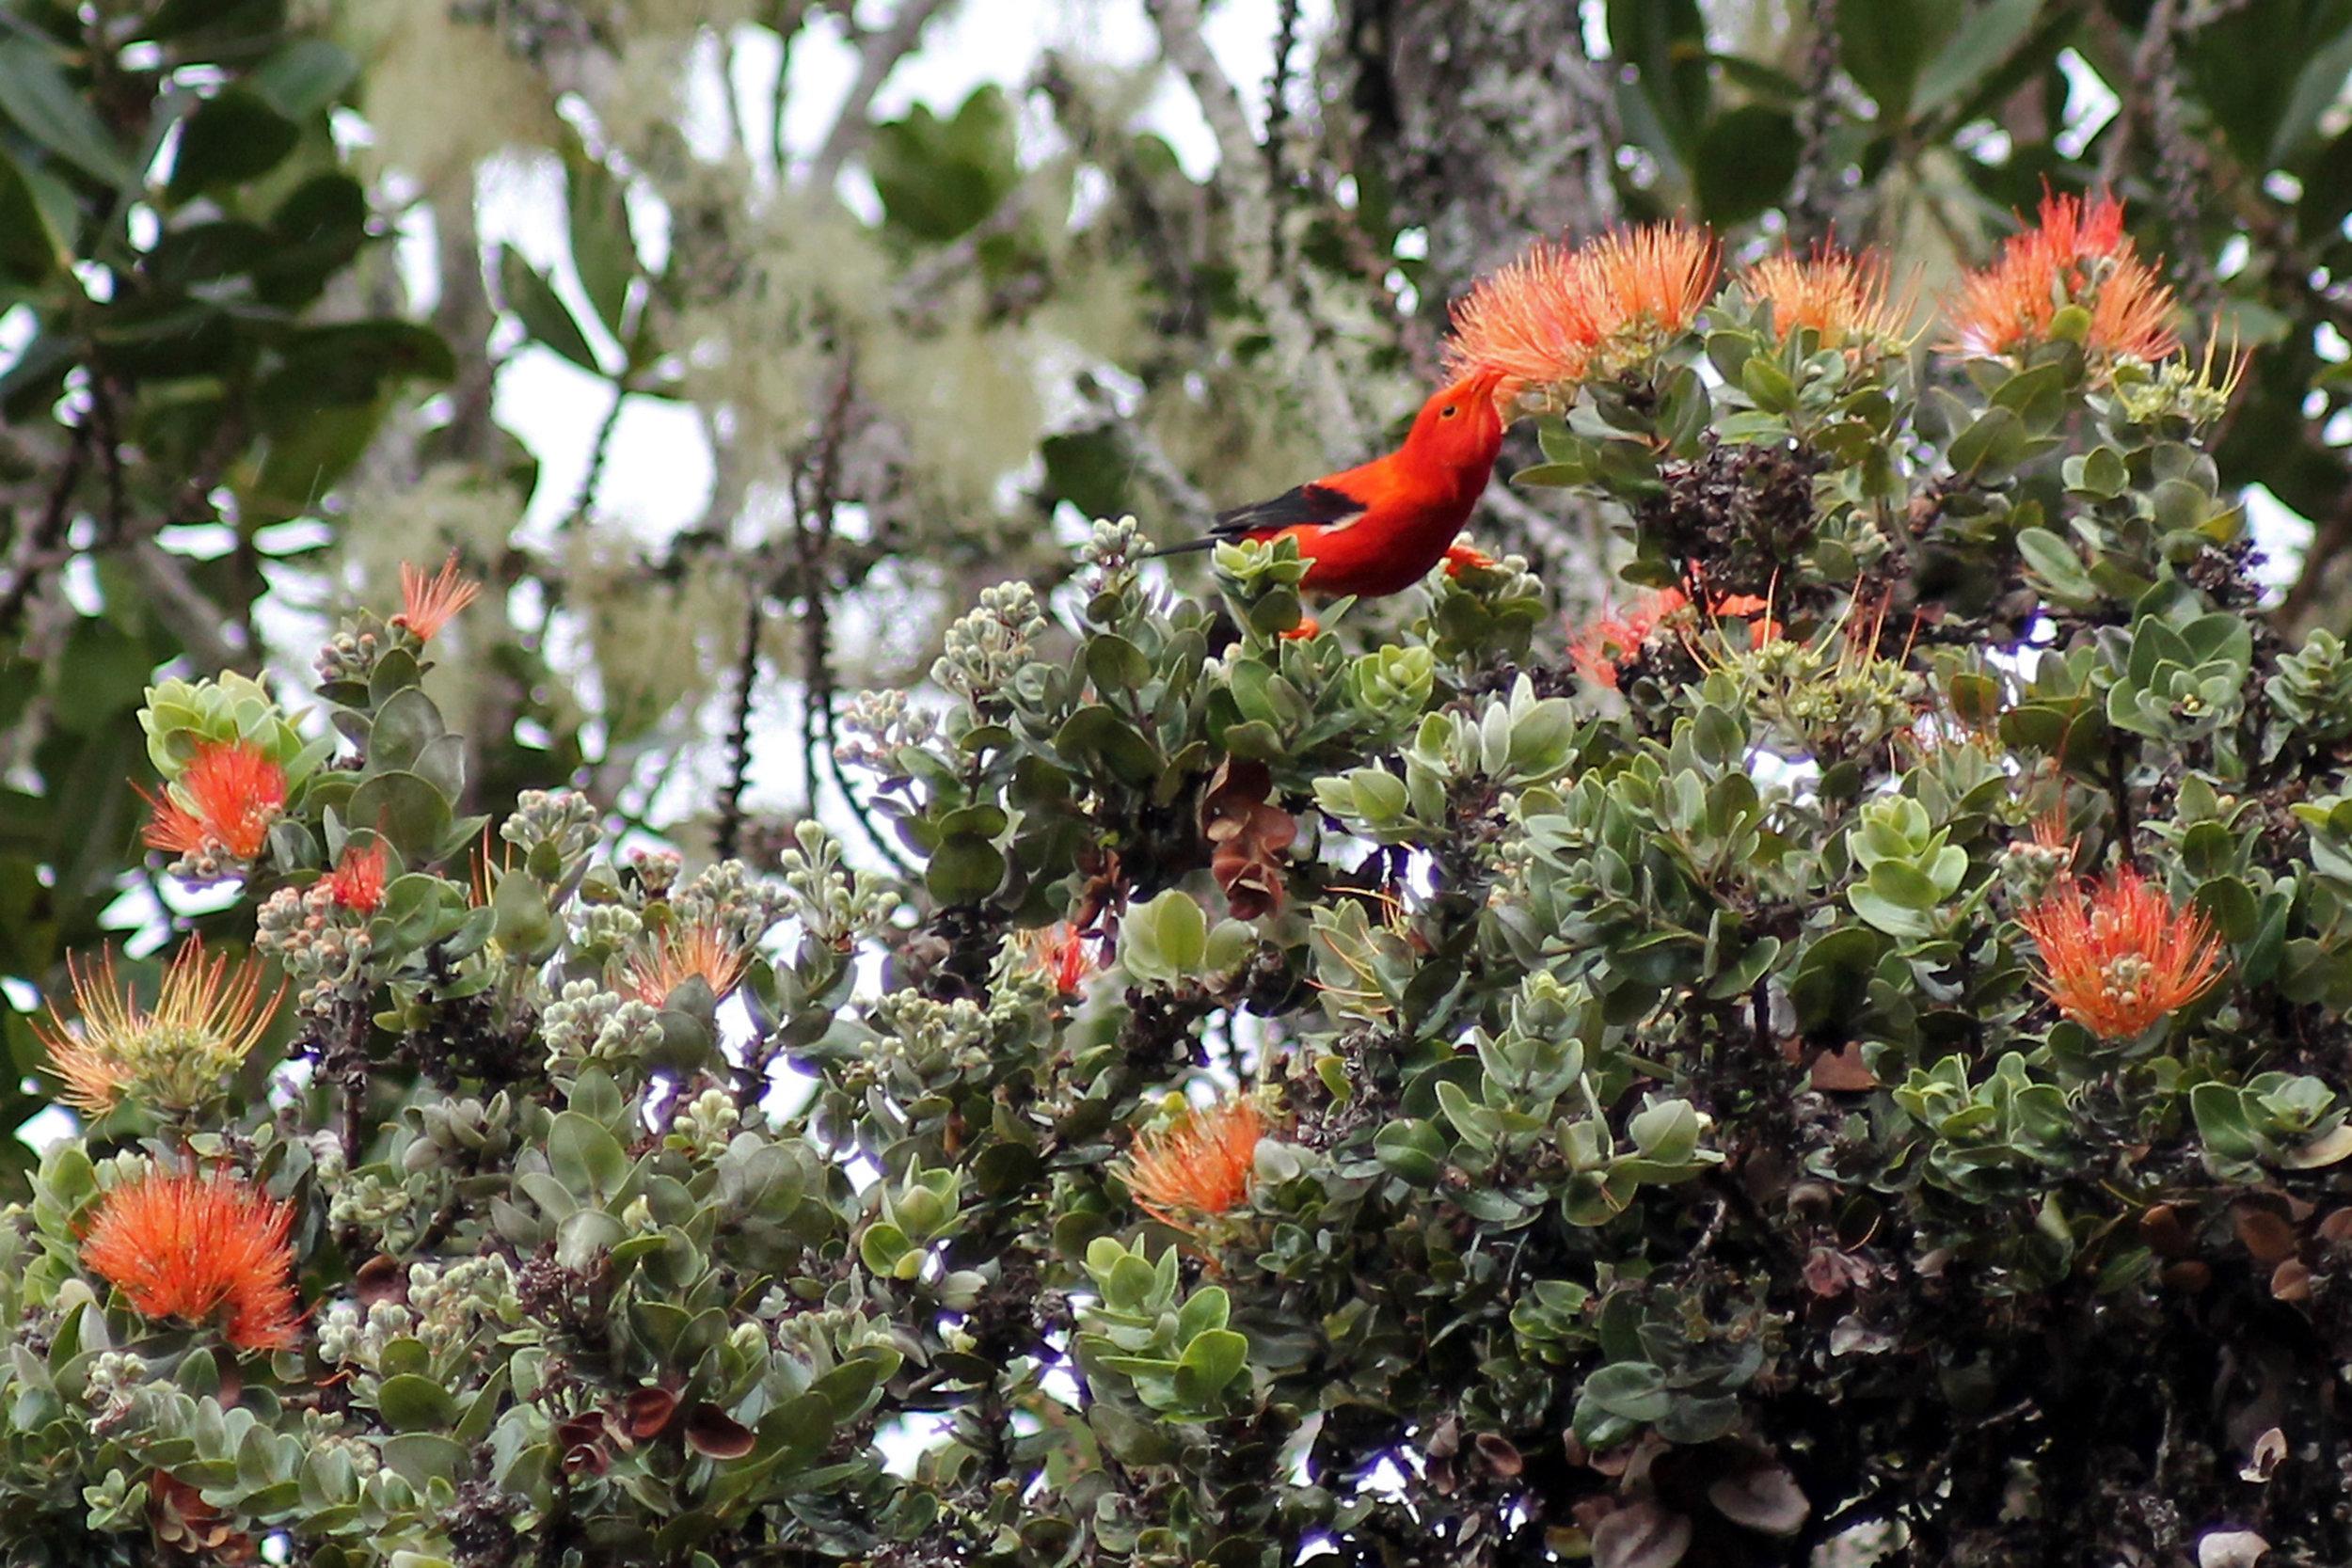 The Hawaiian honeycreeper bird ʻiʻiwi may lose its home to the Rapid ʻOhiʻa Death razing Hawaiʻi's forests. (Photo © Jared Bernard)